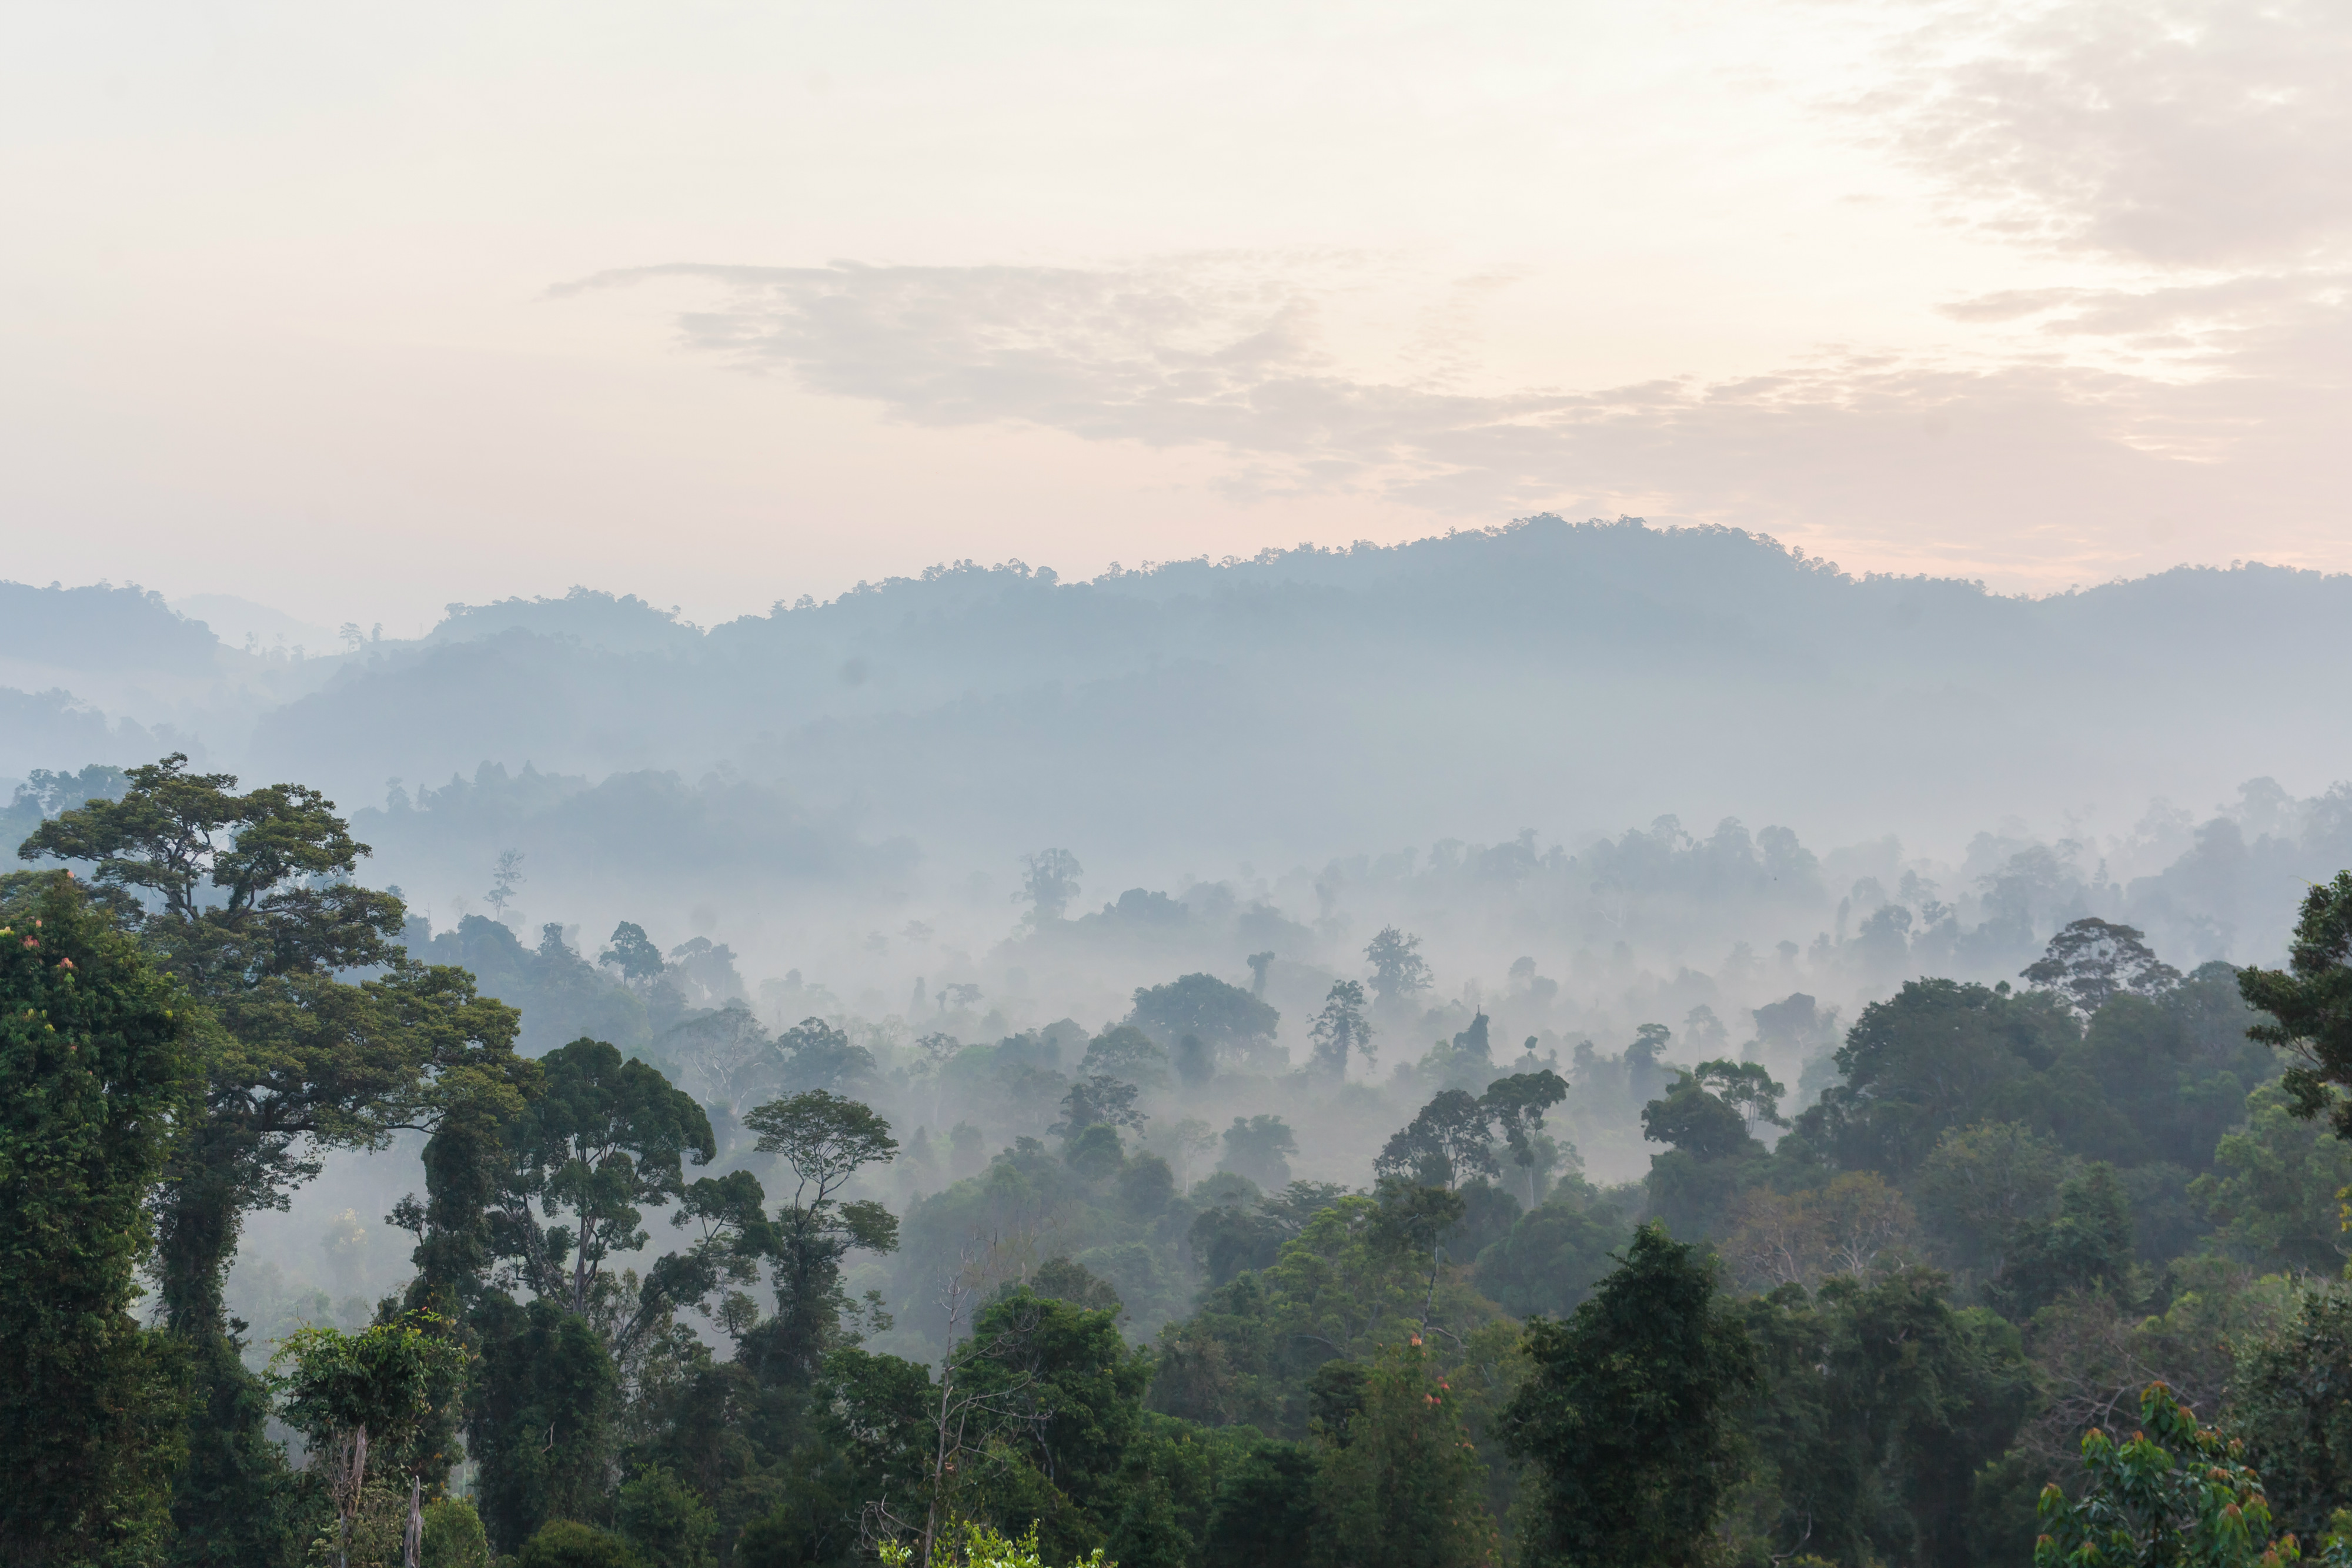 Taman_Negara_landscape_view-1